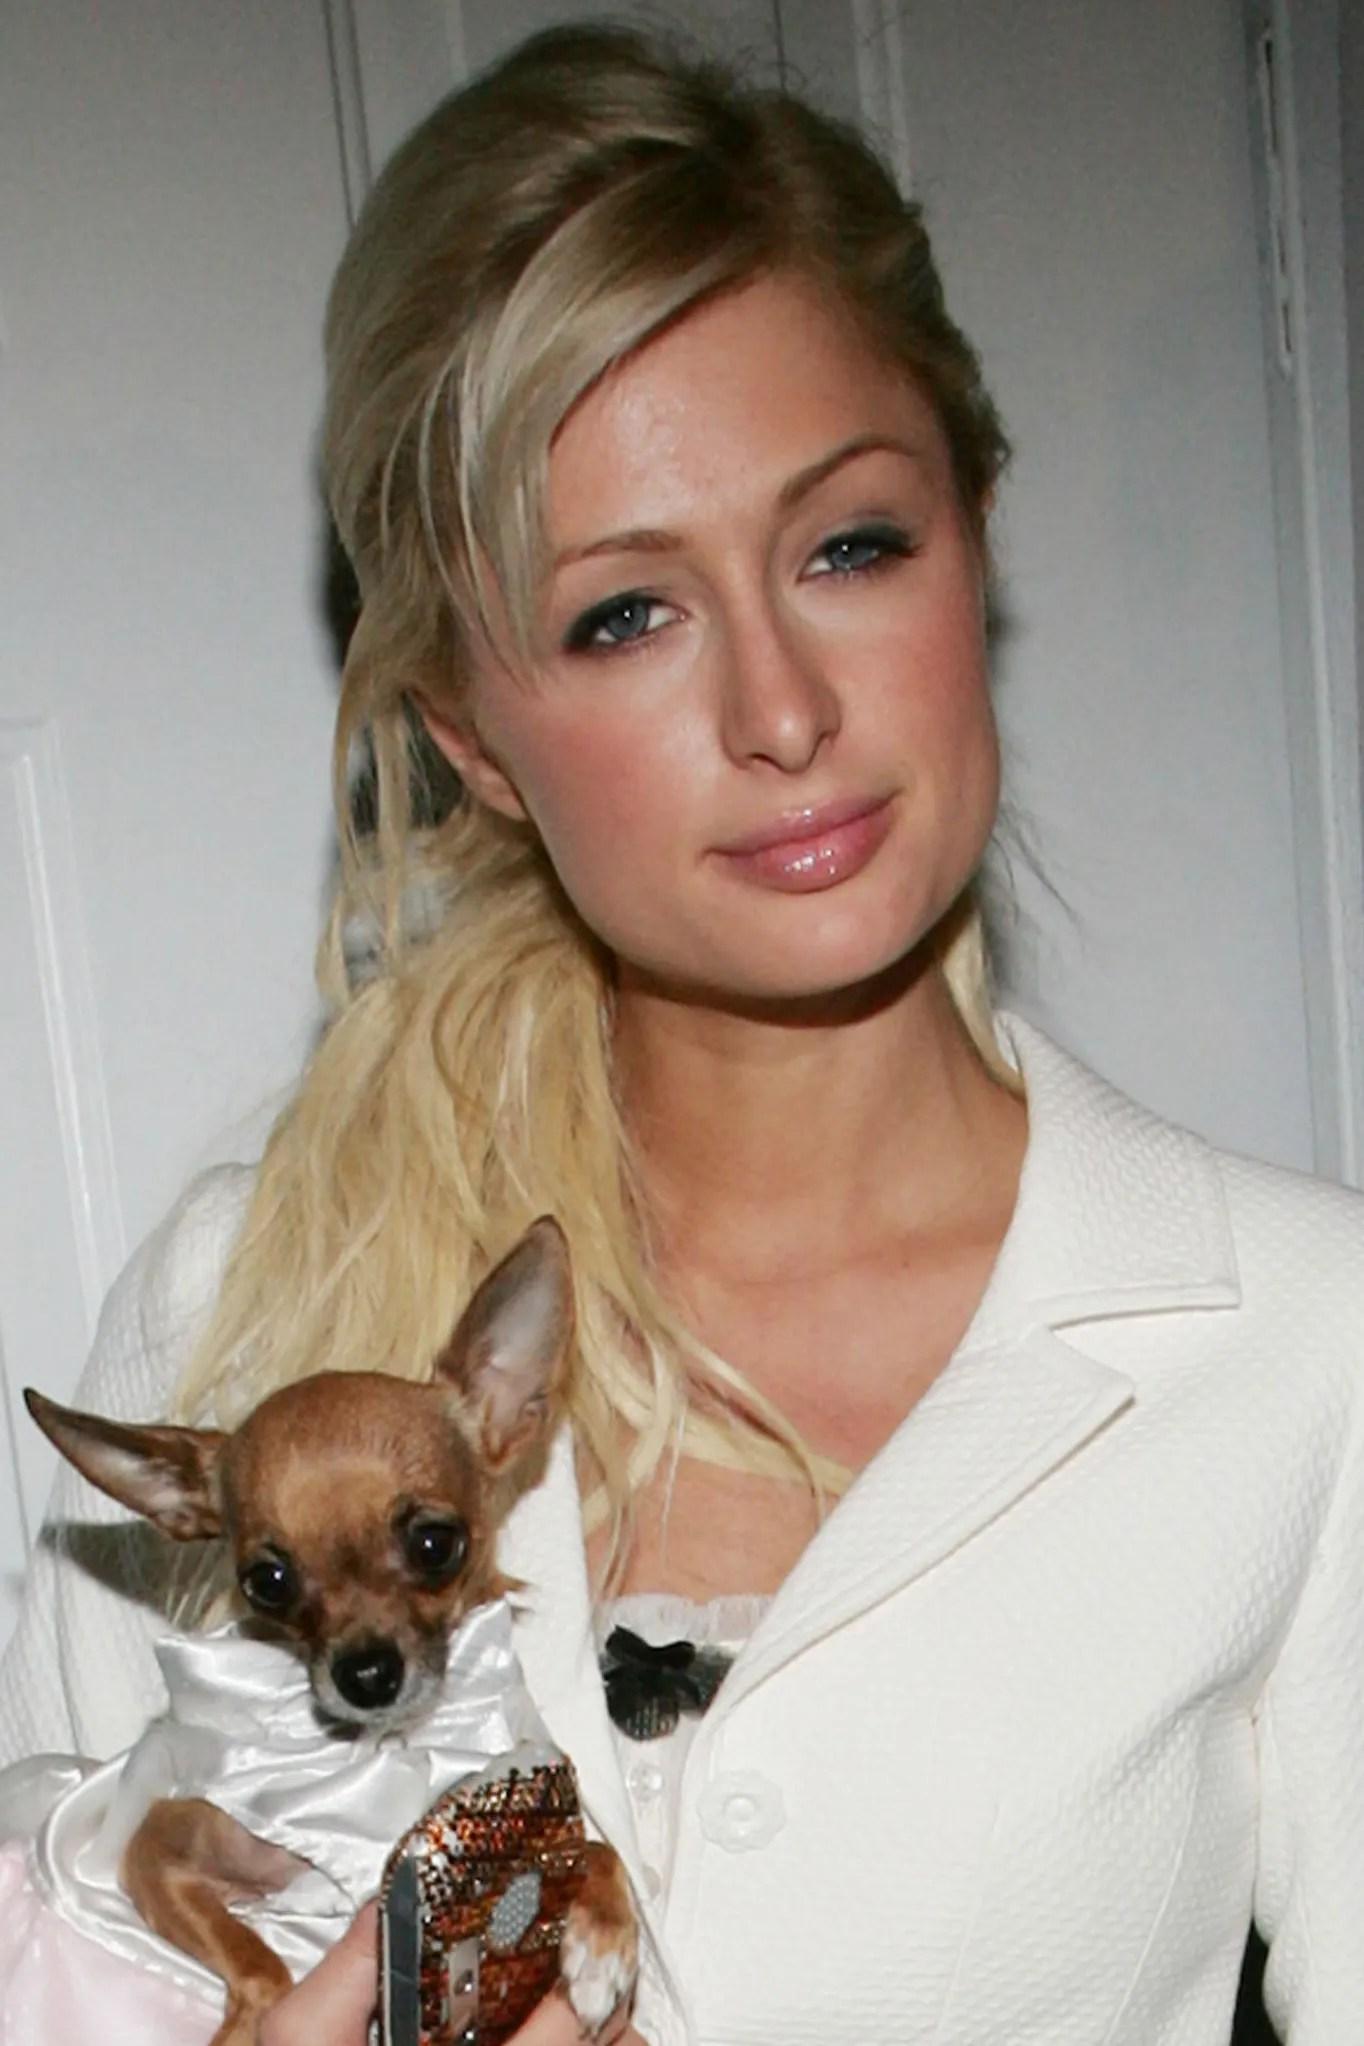 London Tipton Paris Hilton : london, tipton, paris, hilton, Paris, Hilton, Accused, Stealing, Viral, Tweet, Internet, Vogue